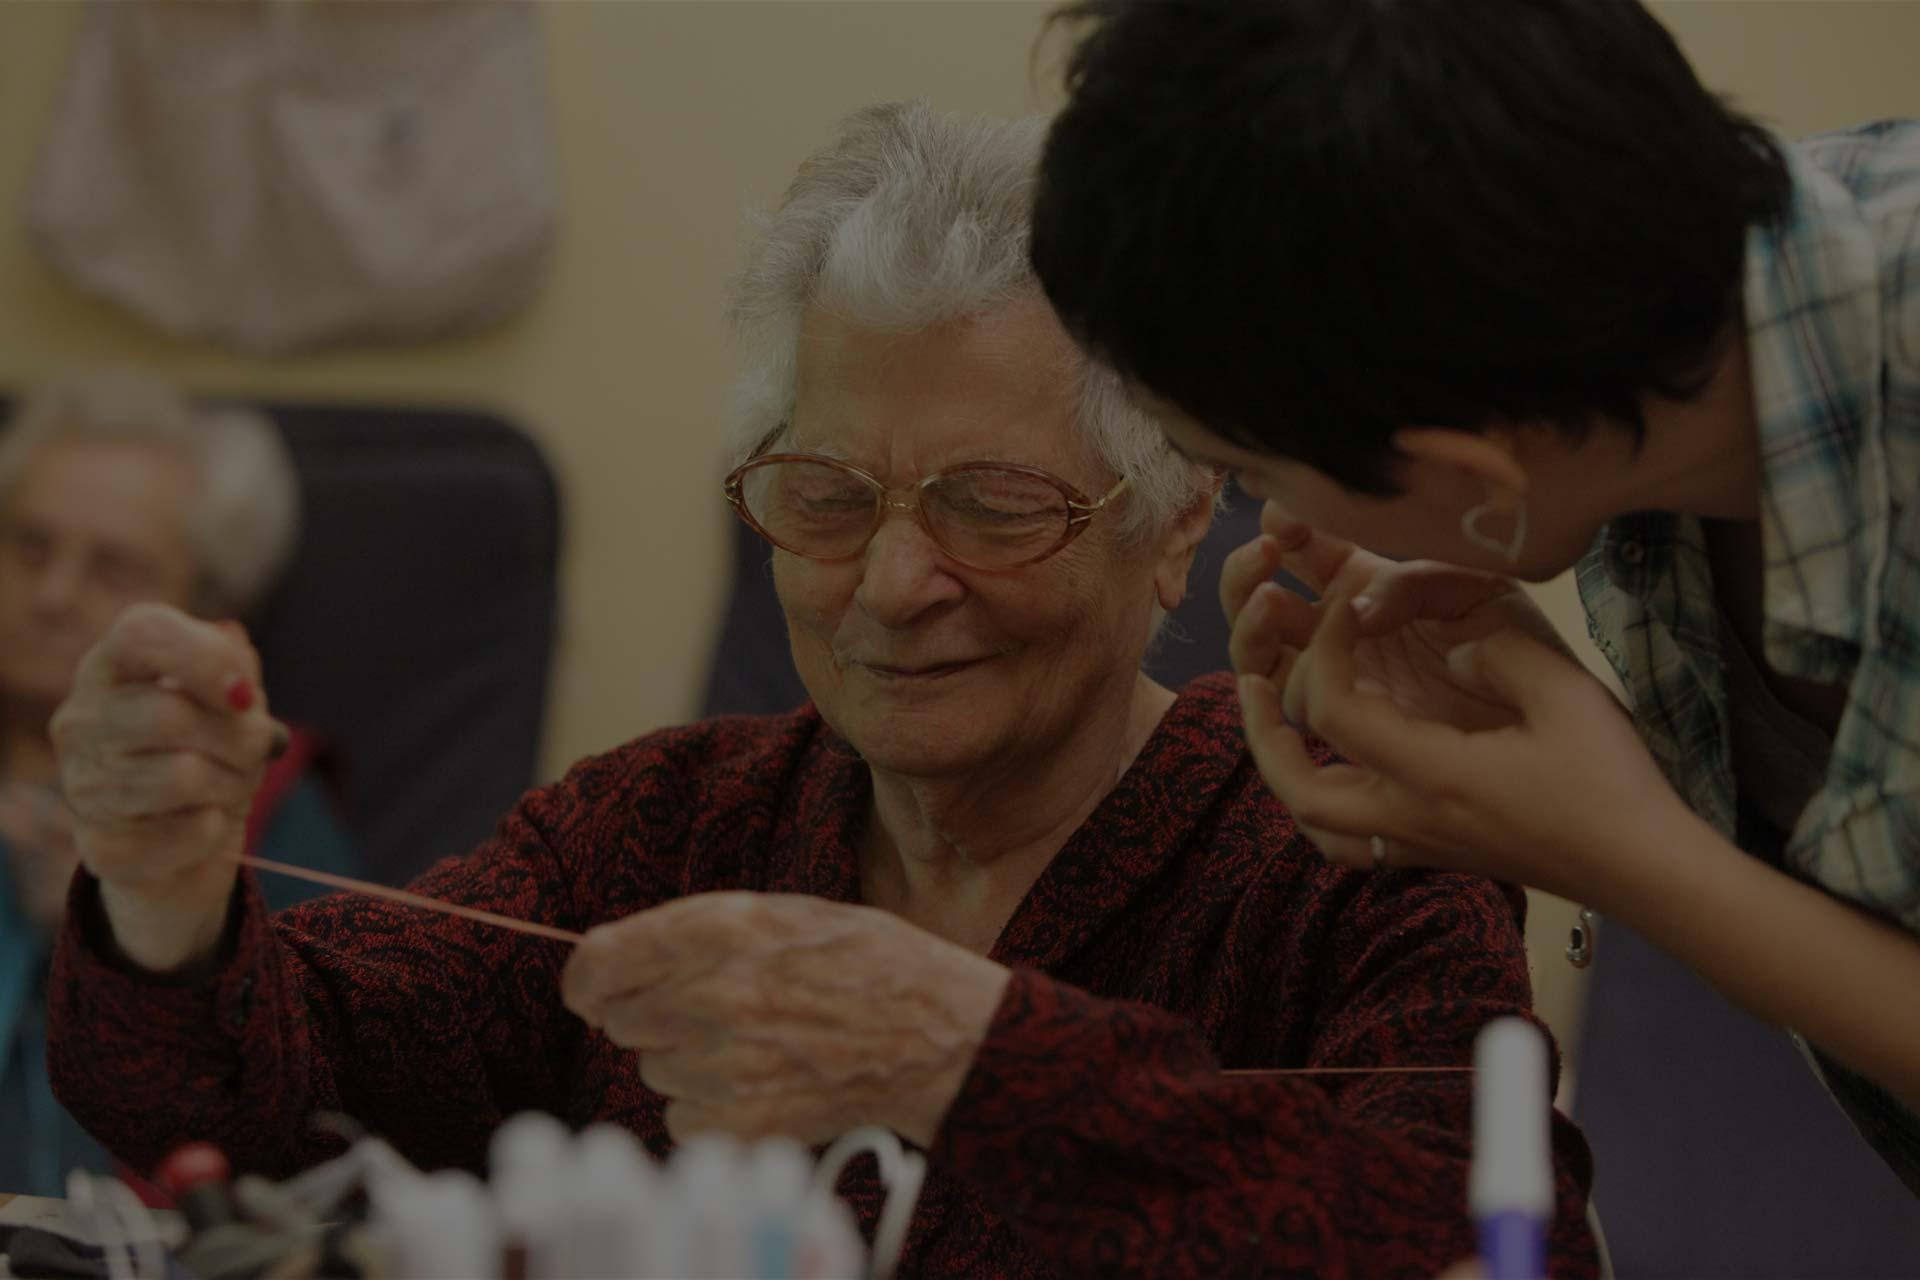 Anziana che cuce